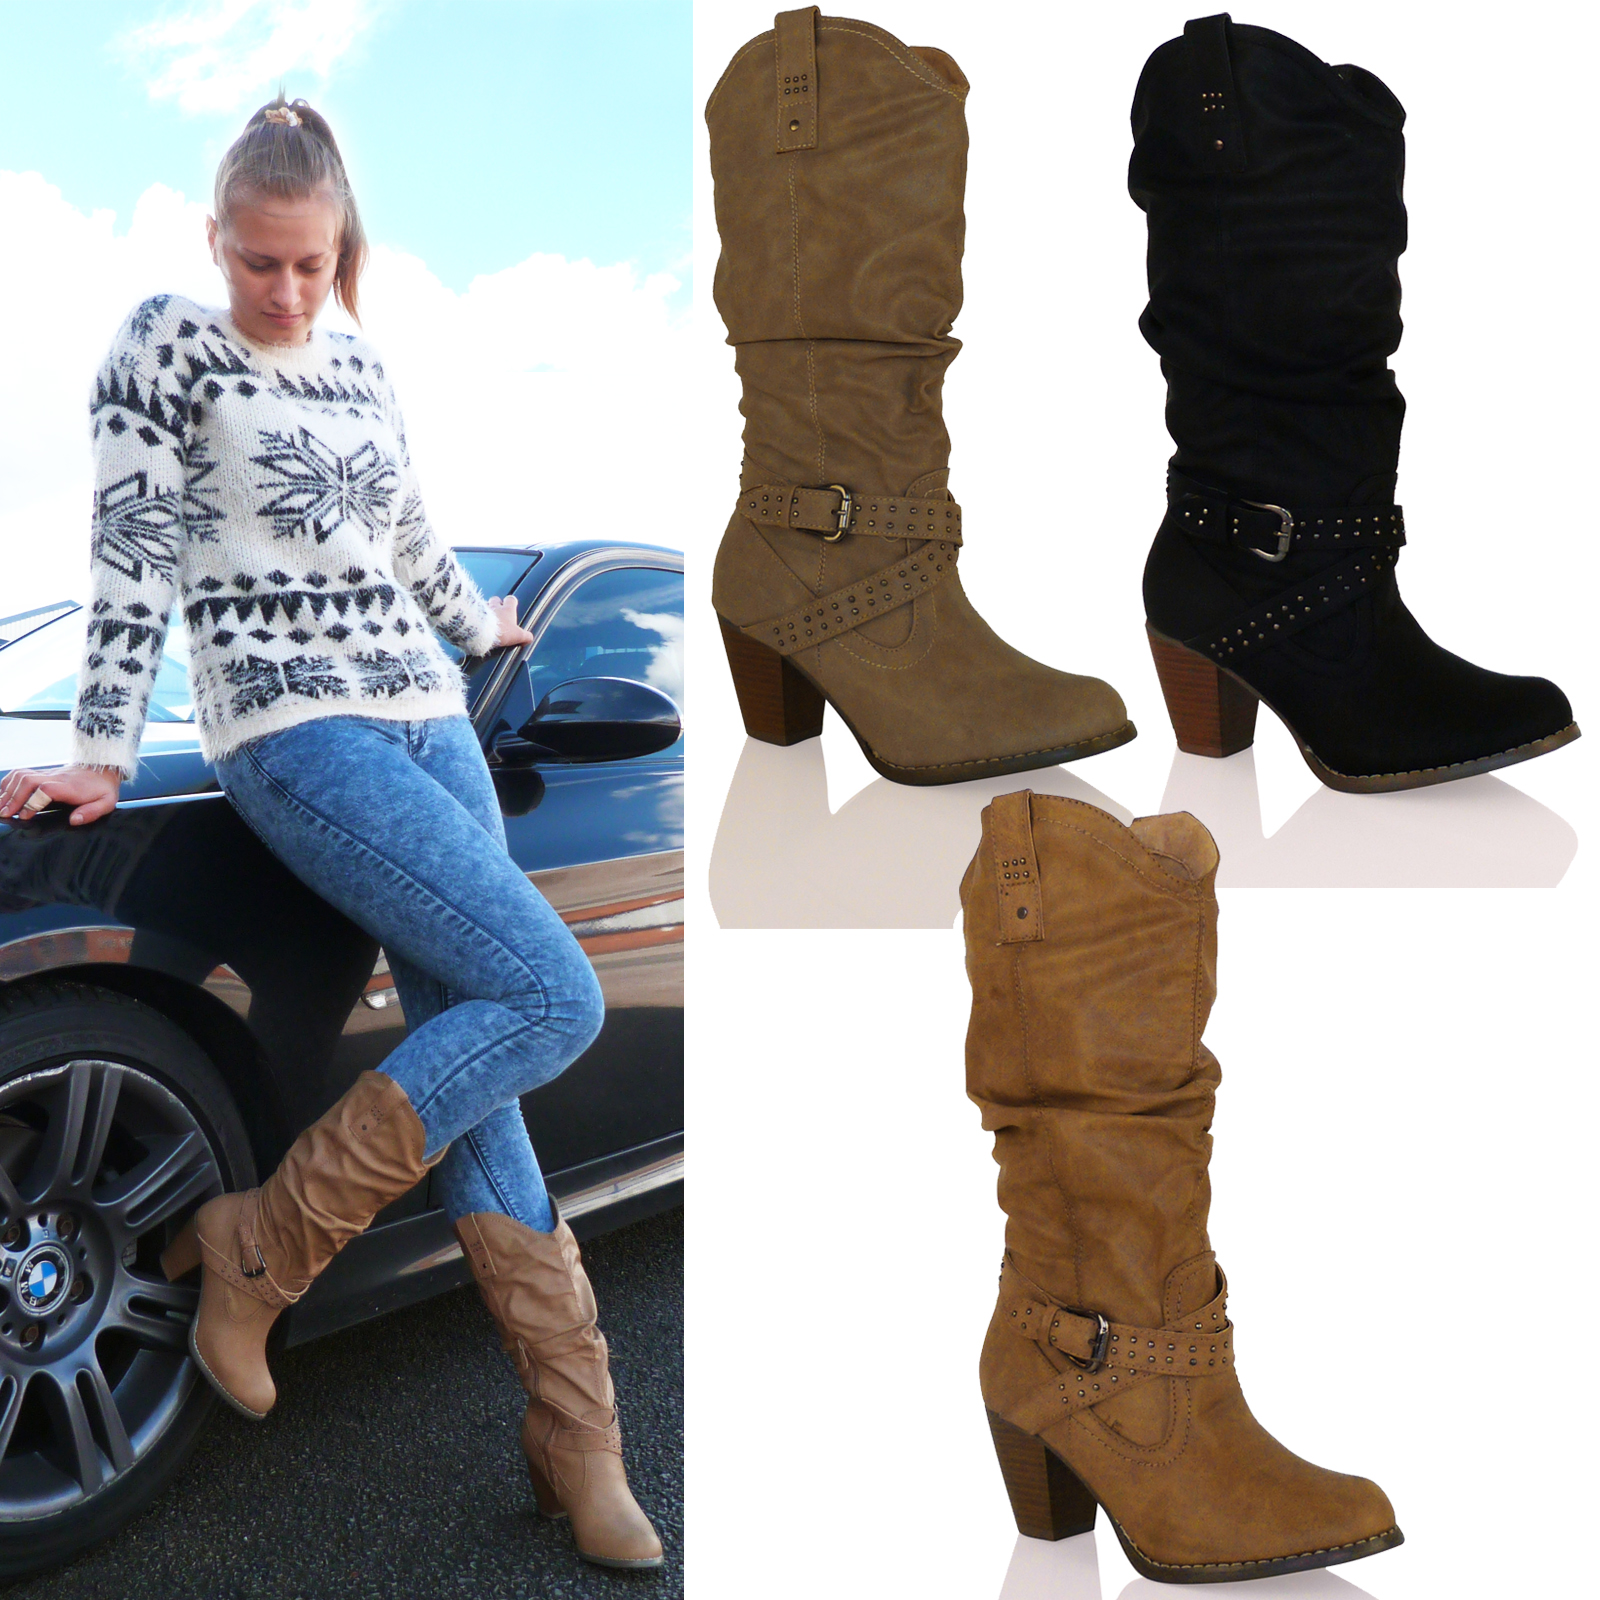 d3y womens mid high heel cowboy western mid calf boots. Black Bedroom Furniture Sets. Home Design Ideas